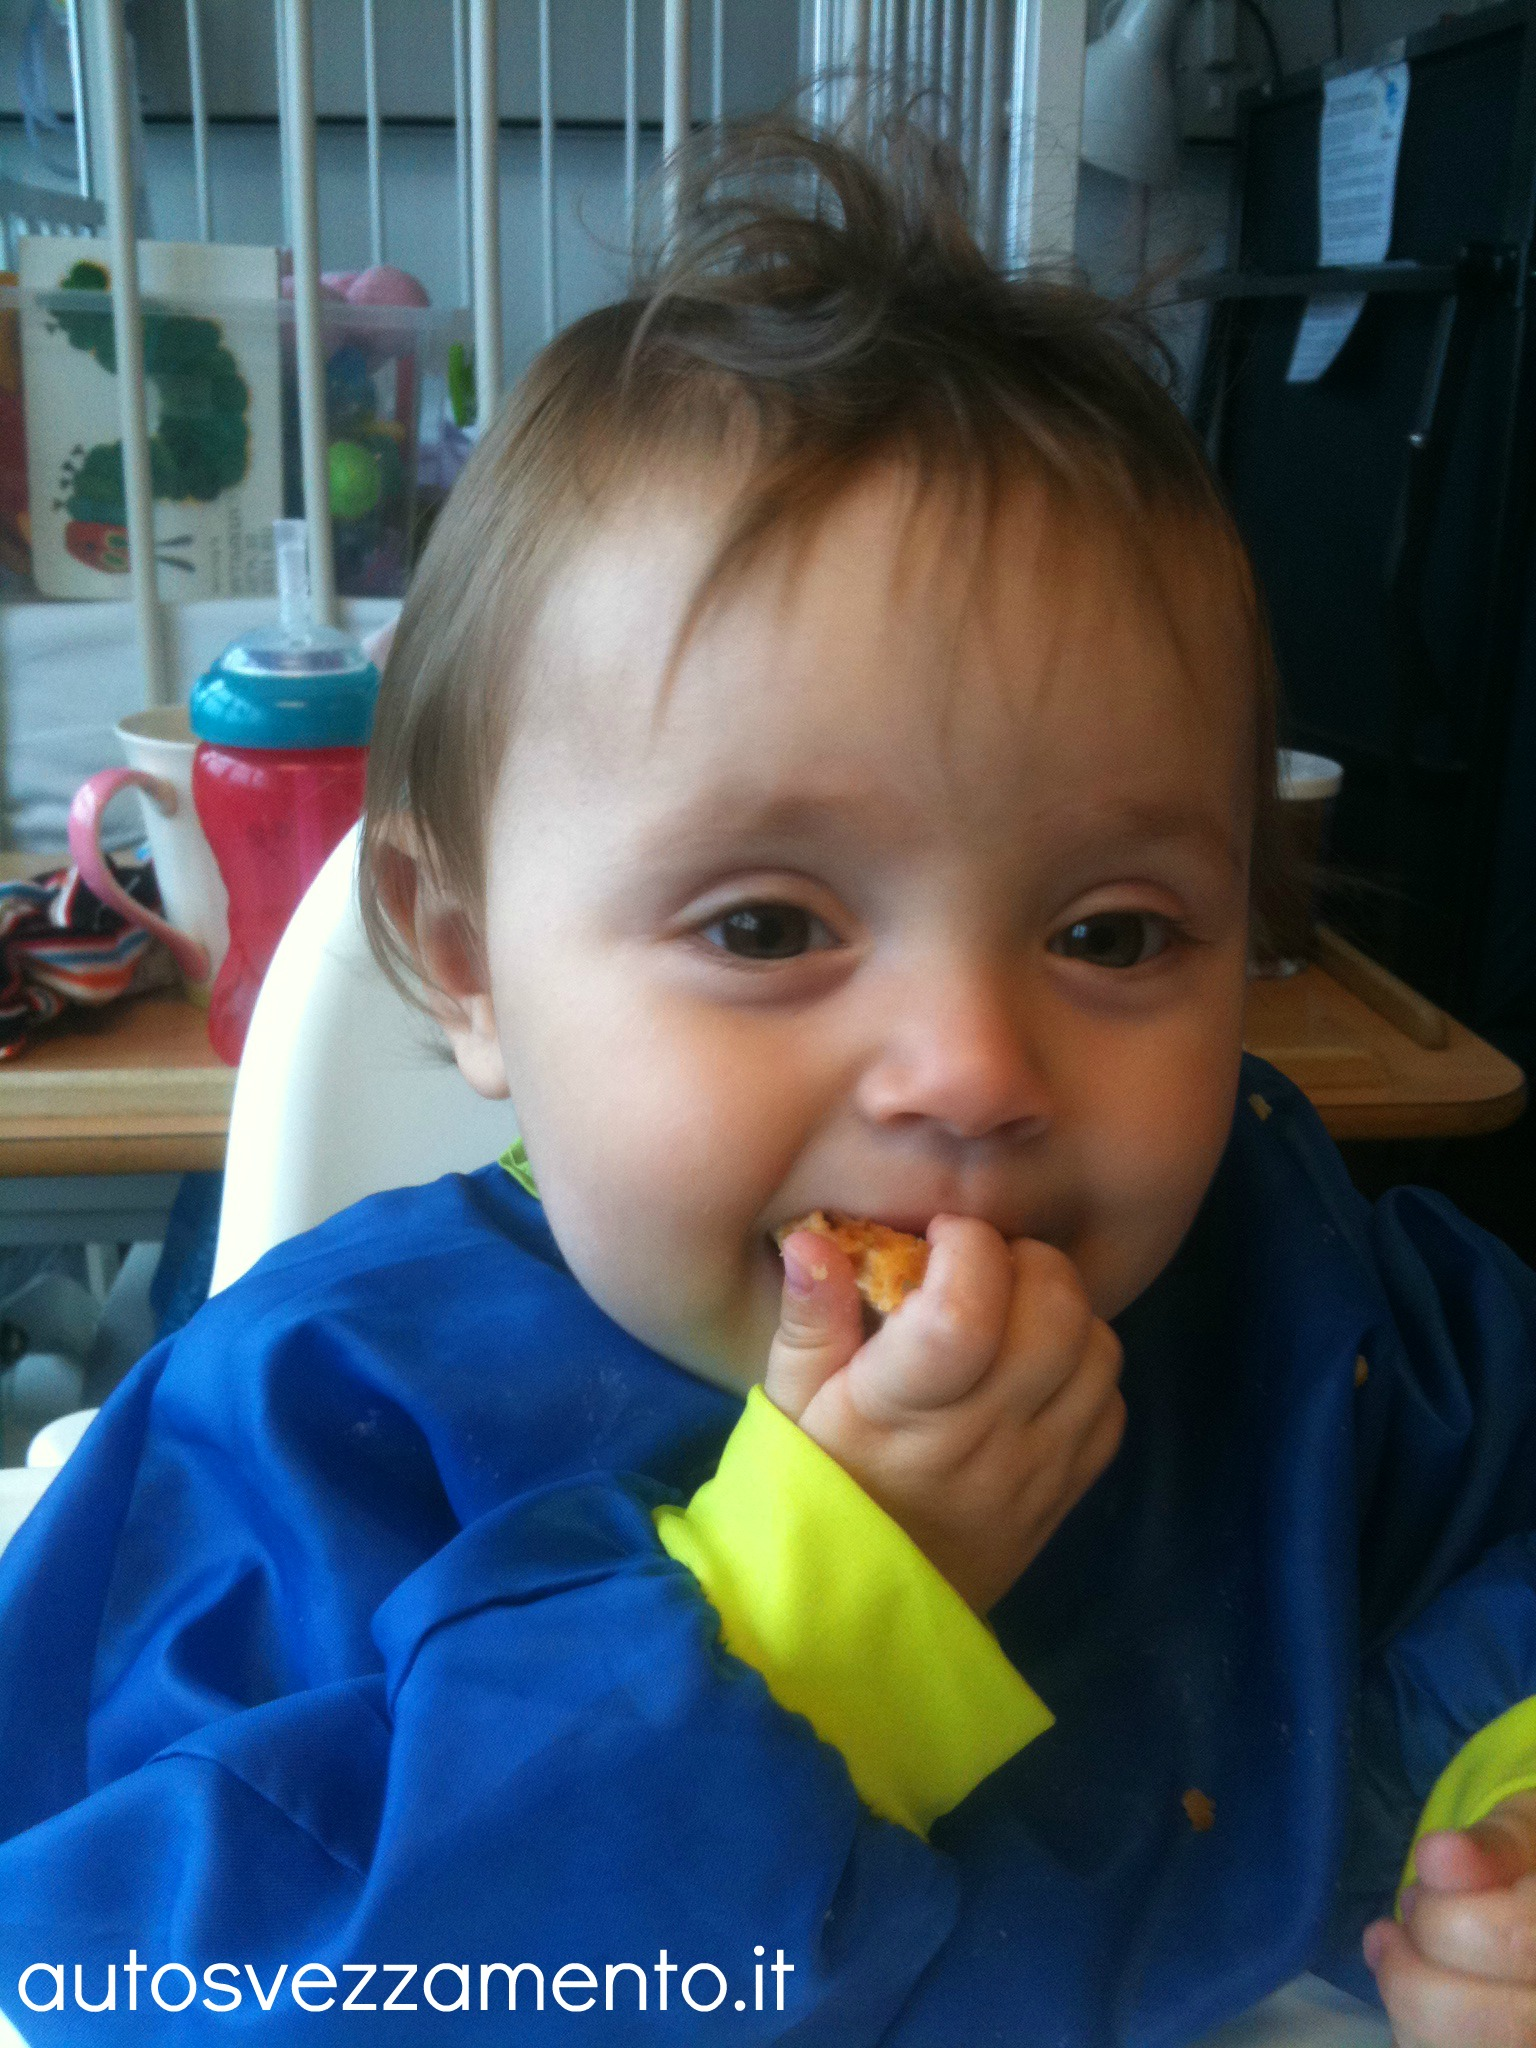 Bambina mangia da sola